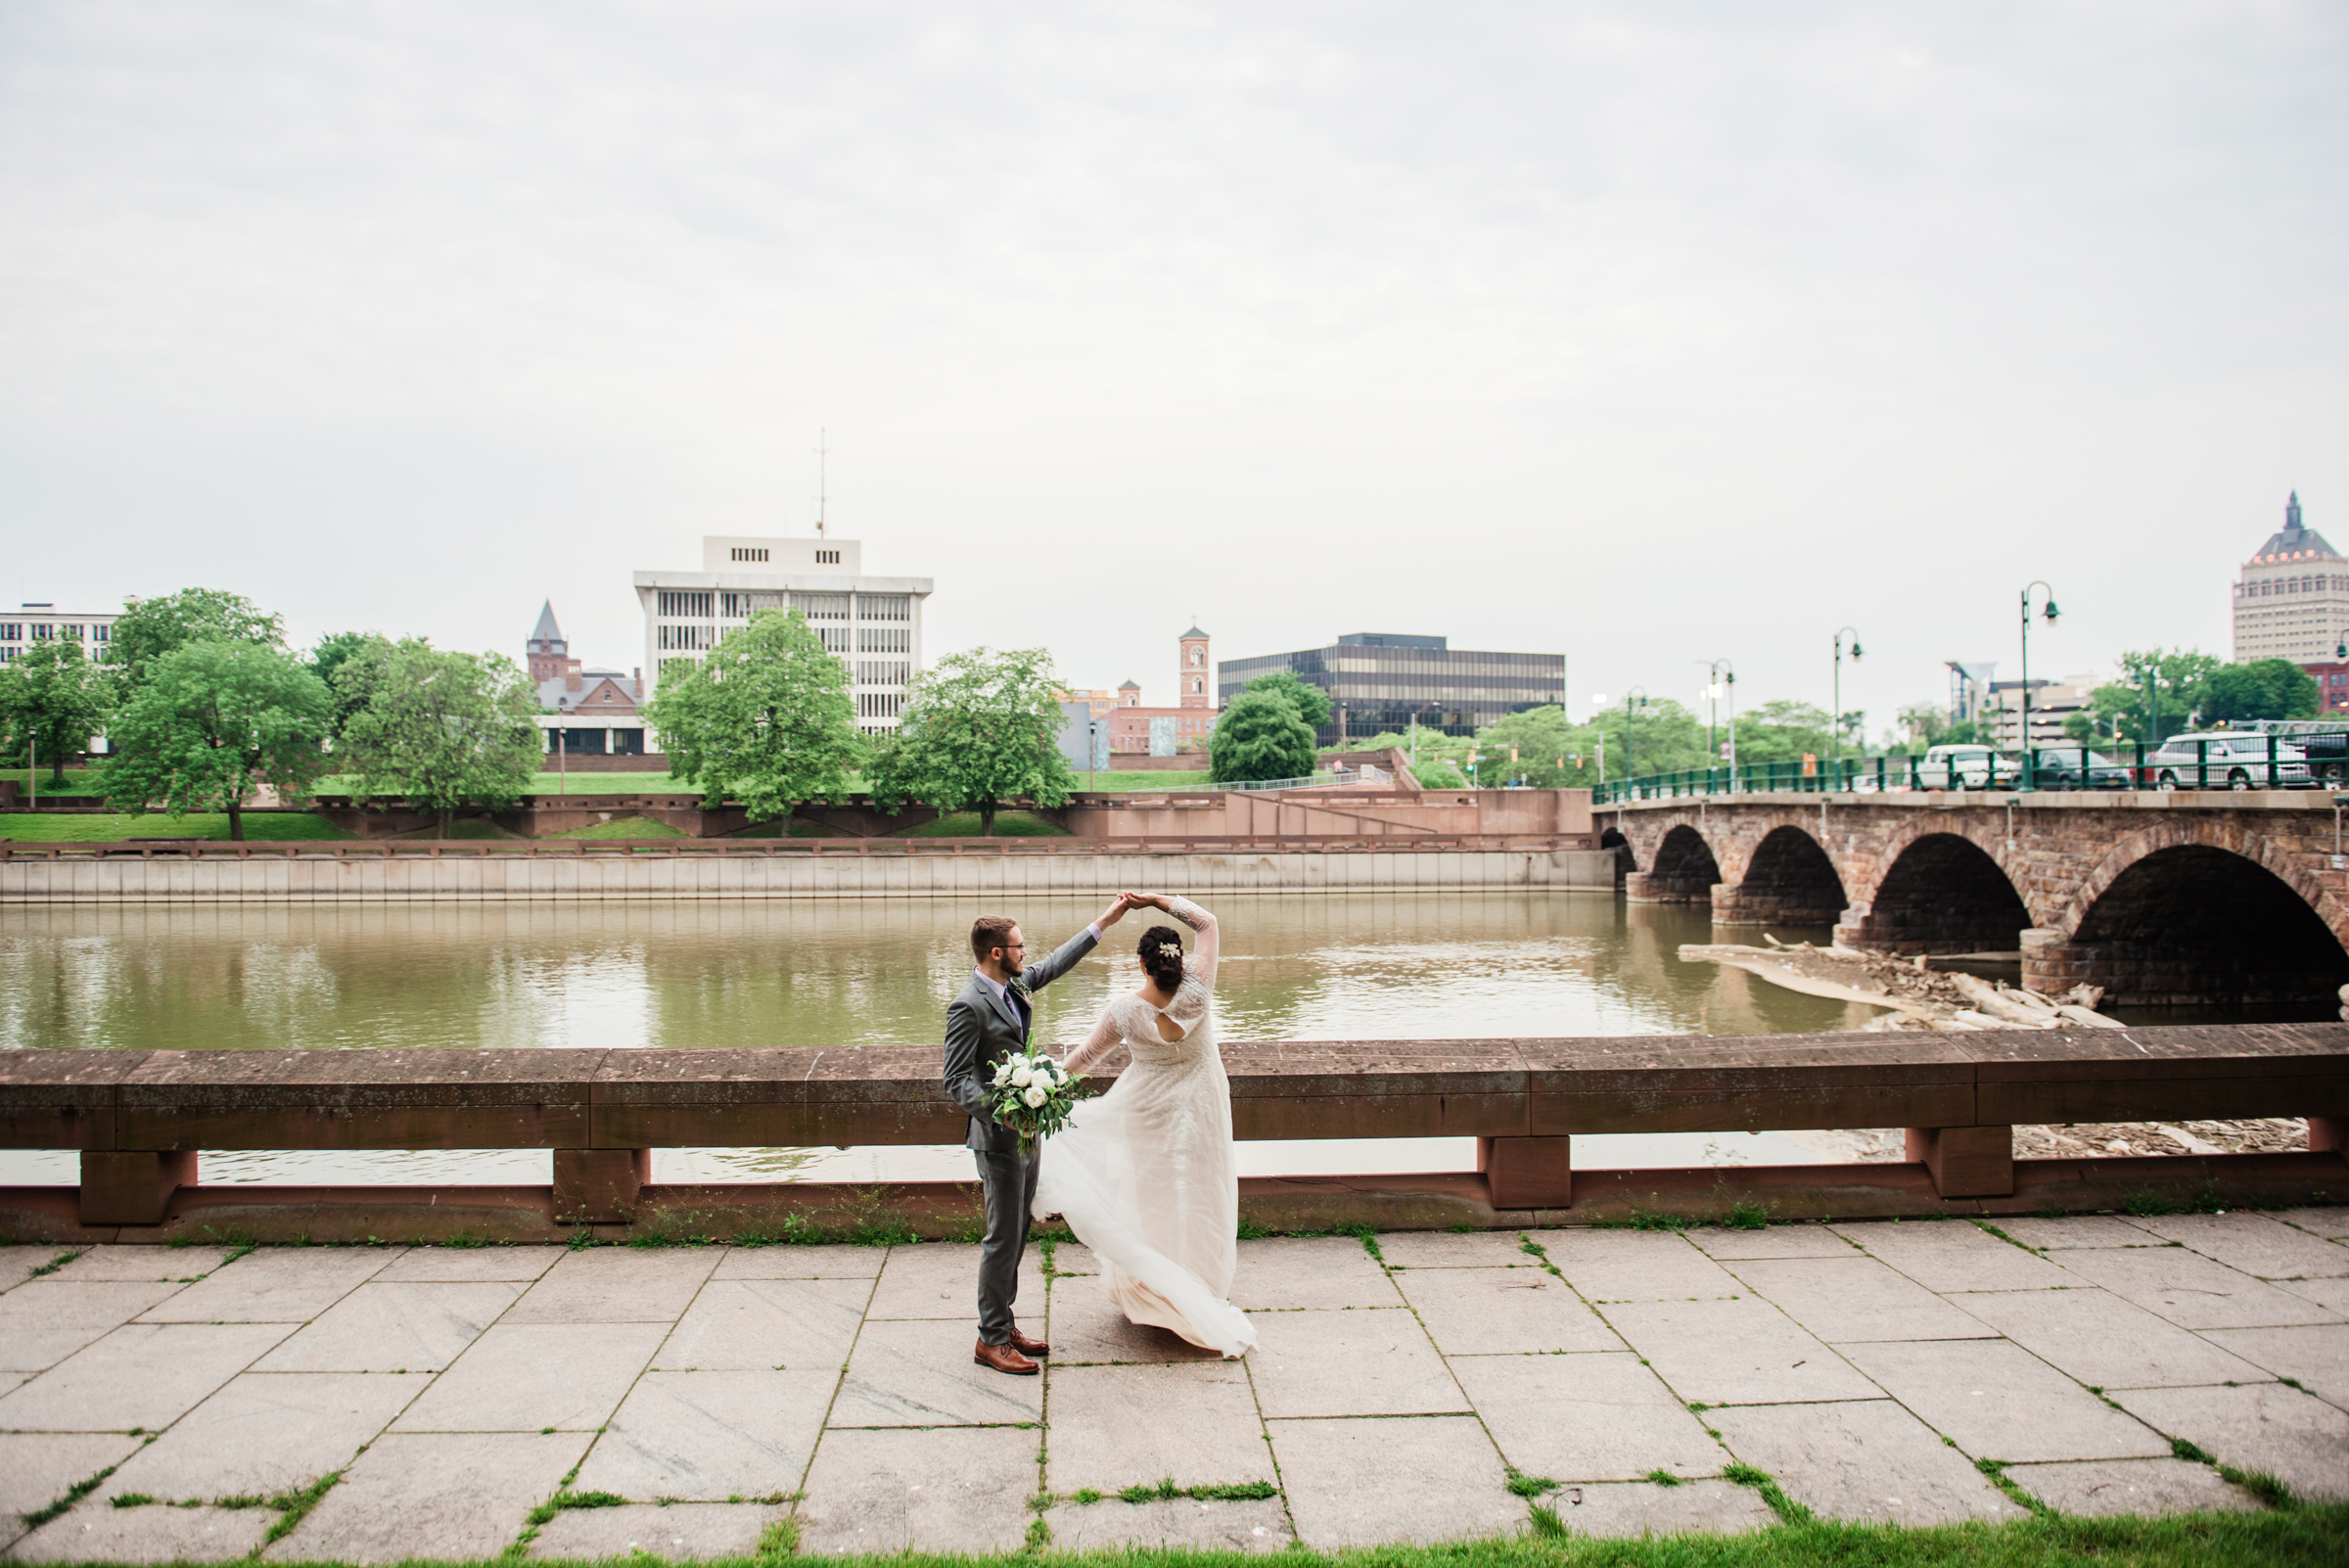 Studio_180_Lamberton_Conservatory_Rochester_Wedding_JILL_STUDIO_Rochester_NY_Photographer_DSC_9061.jpg